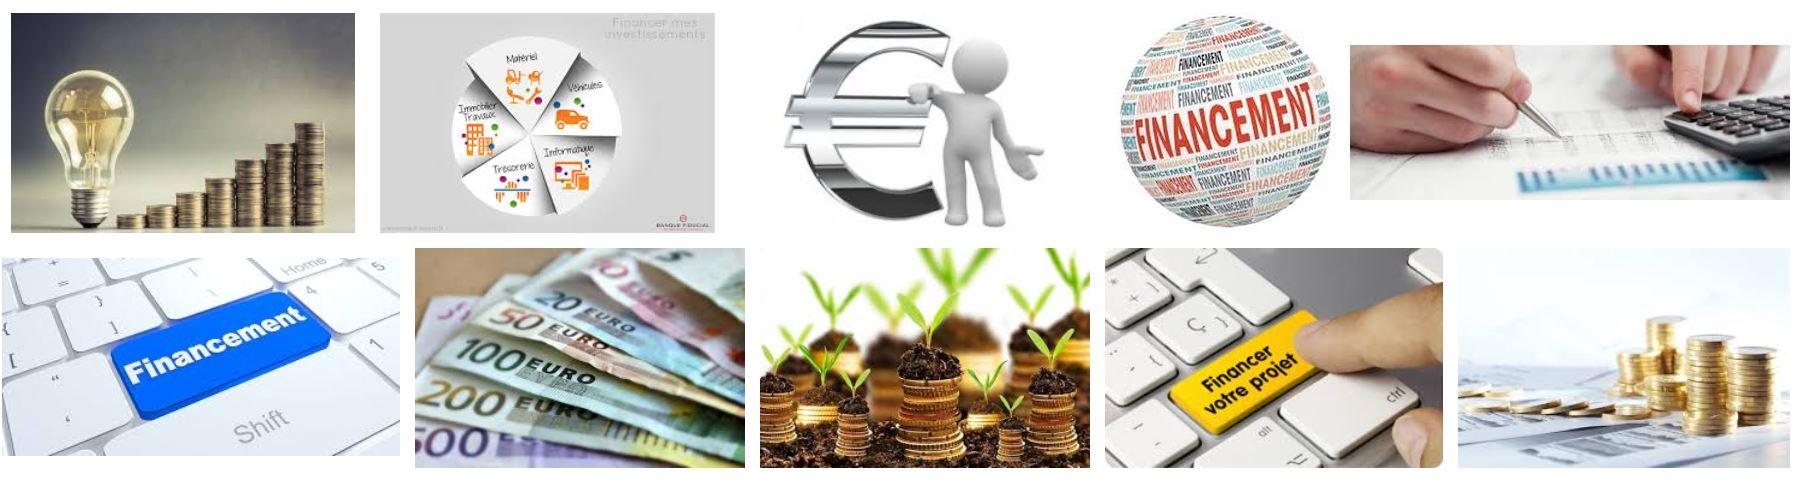 Webinar Franchise Business Club